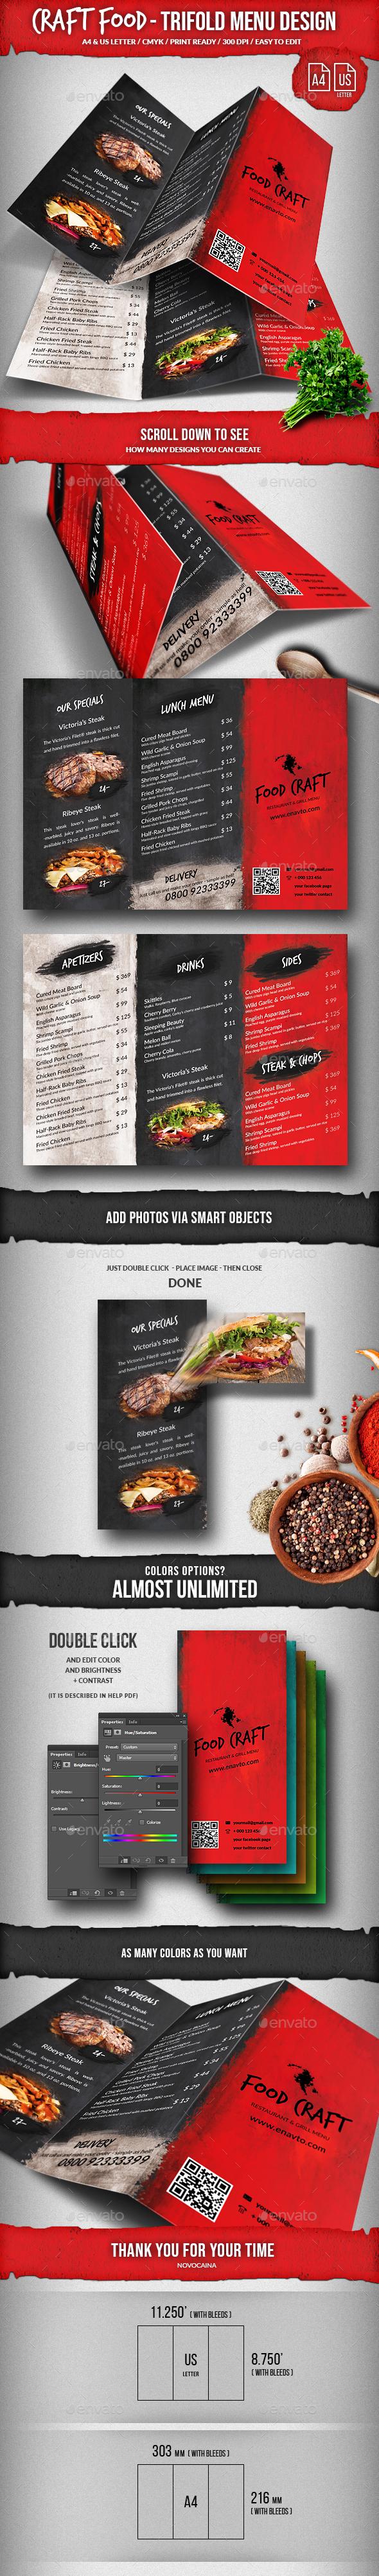 Craft Food Trifold A4 & US Letter Menu Design - Food Menus Print Templates